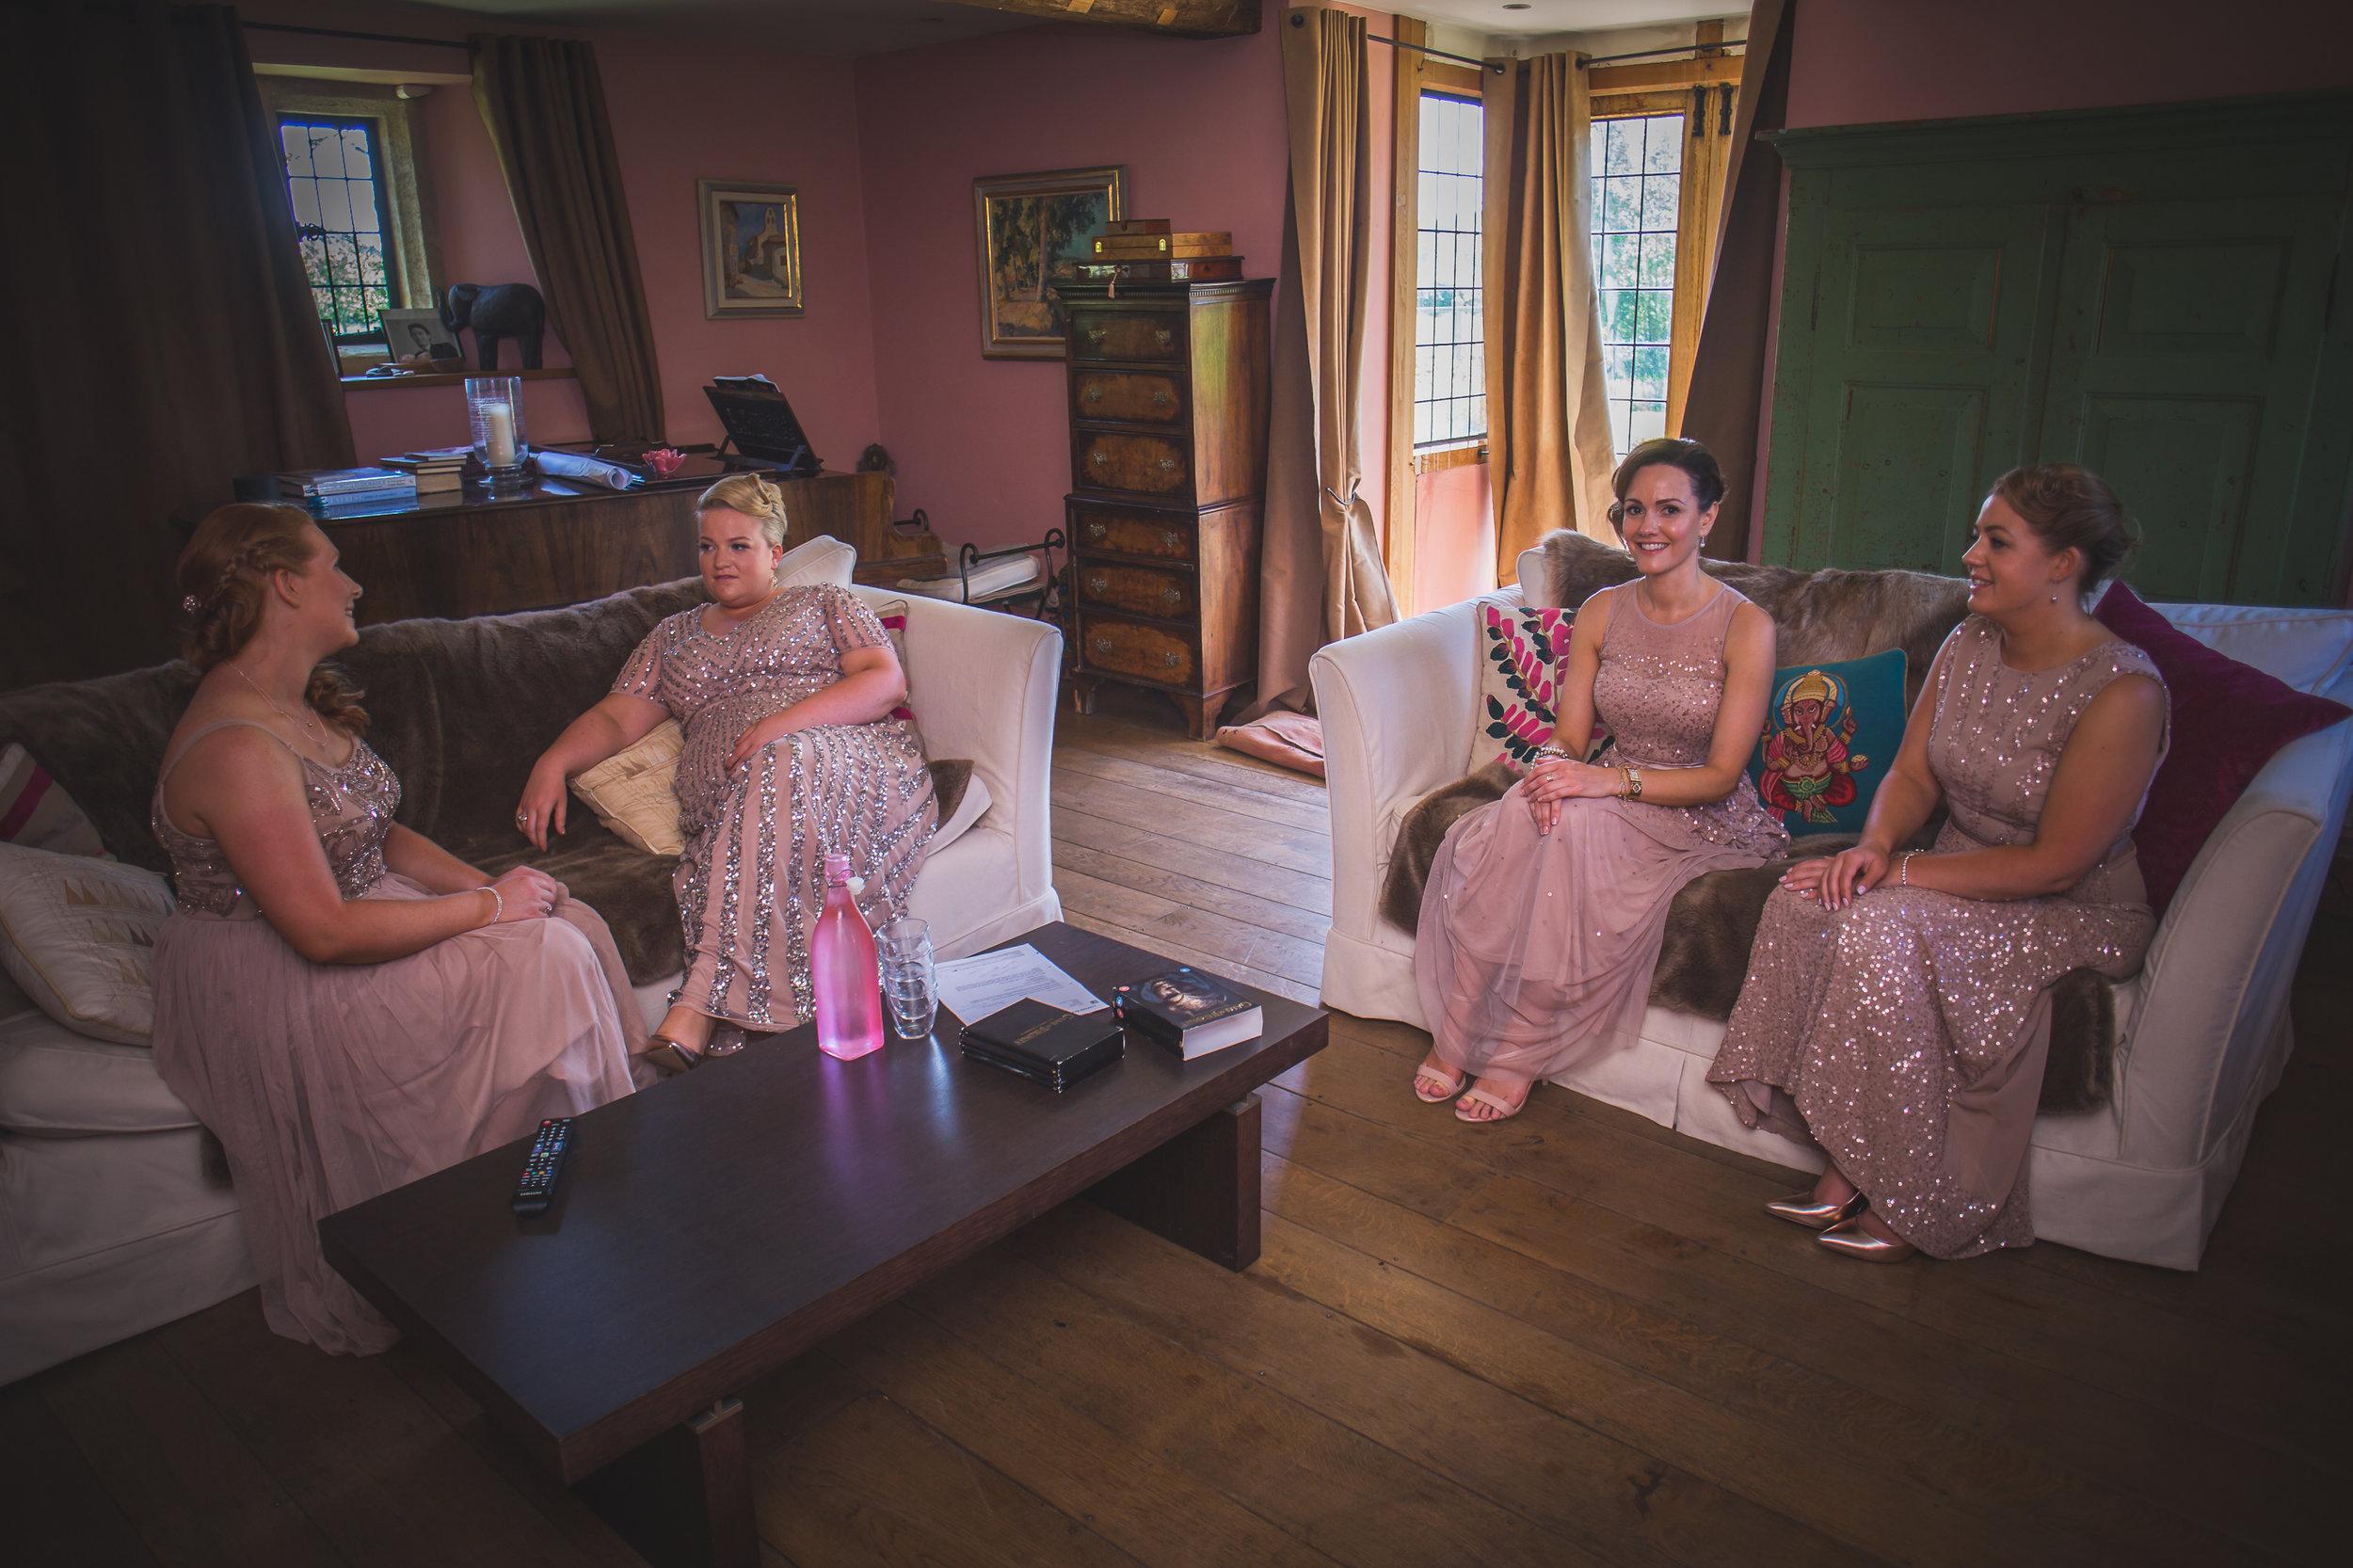 Grittenham Barn female wedding photographers west sussex petworth social-35.jpg